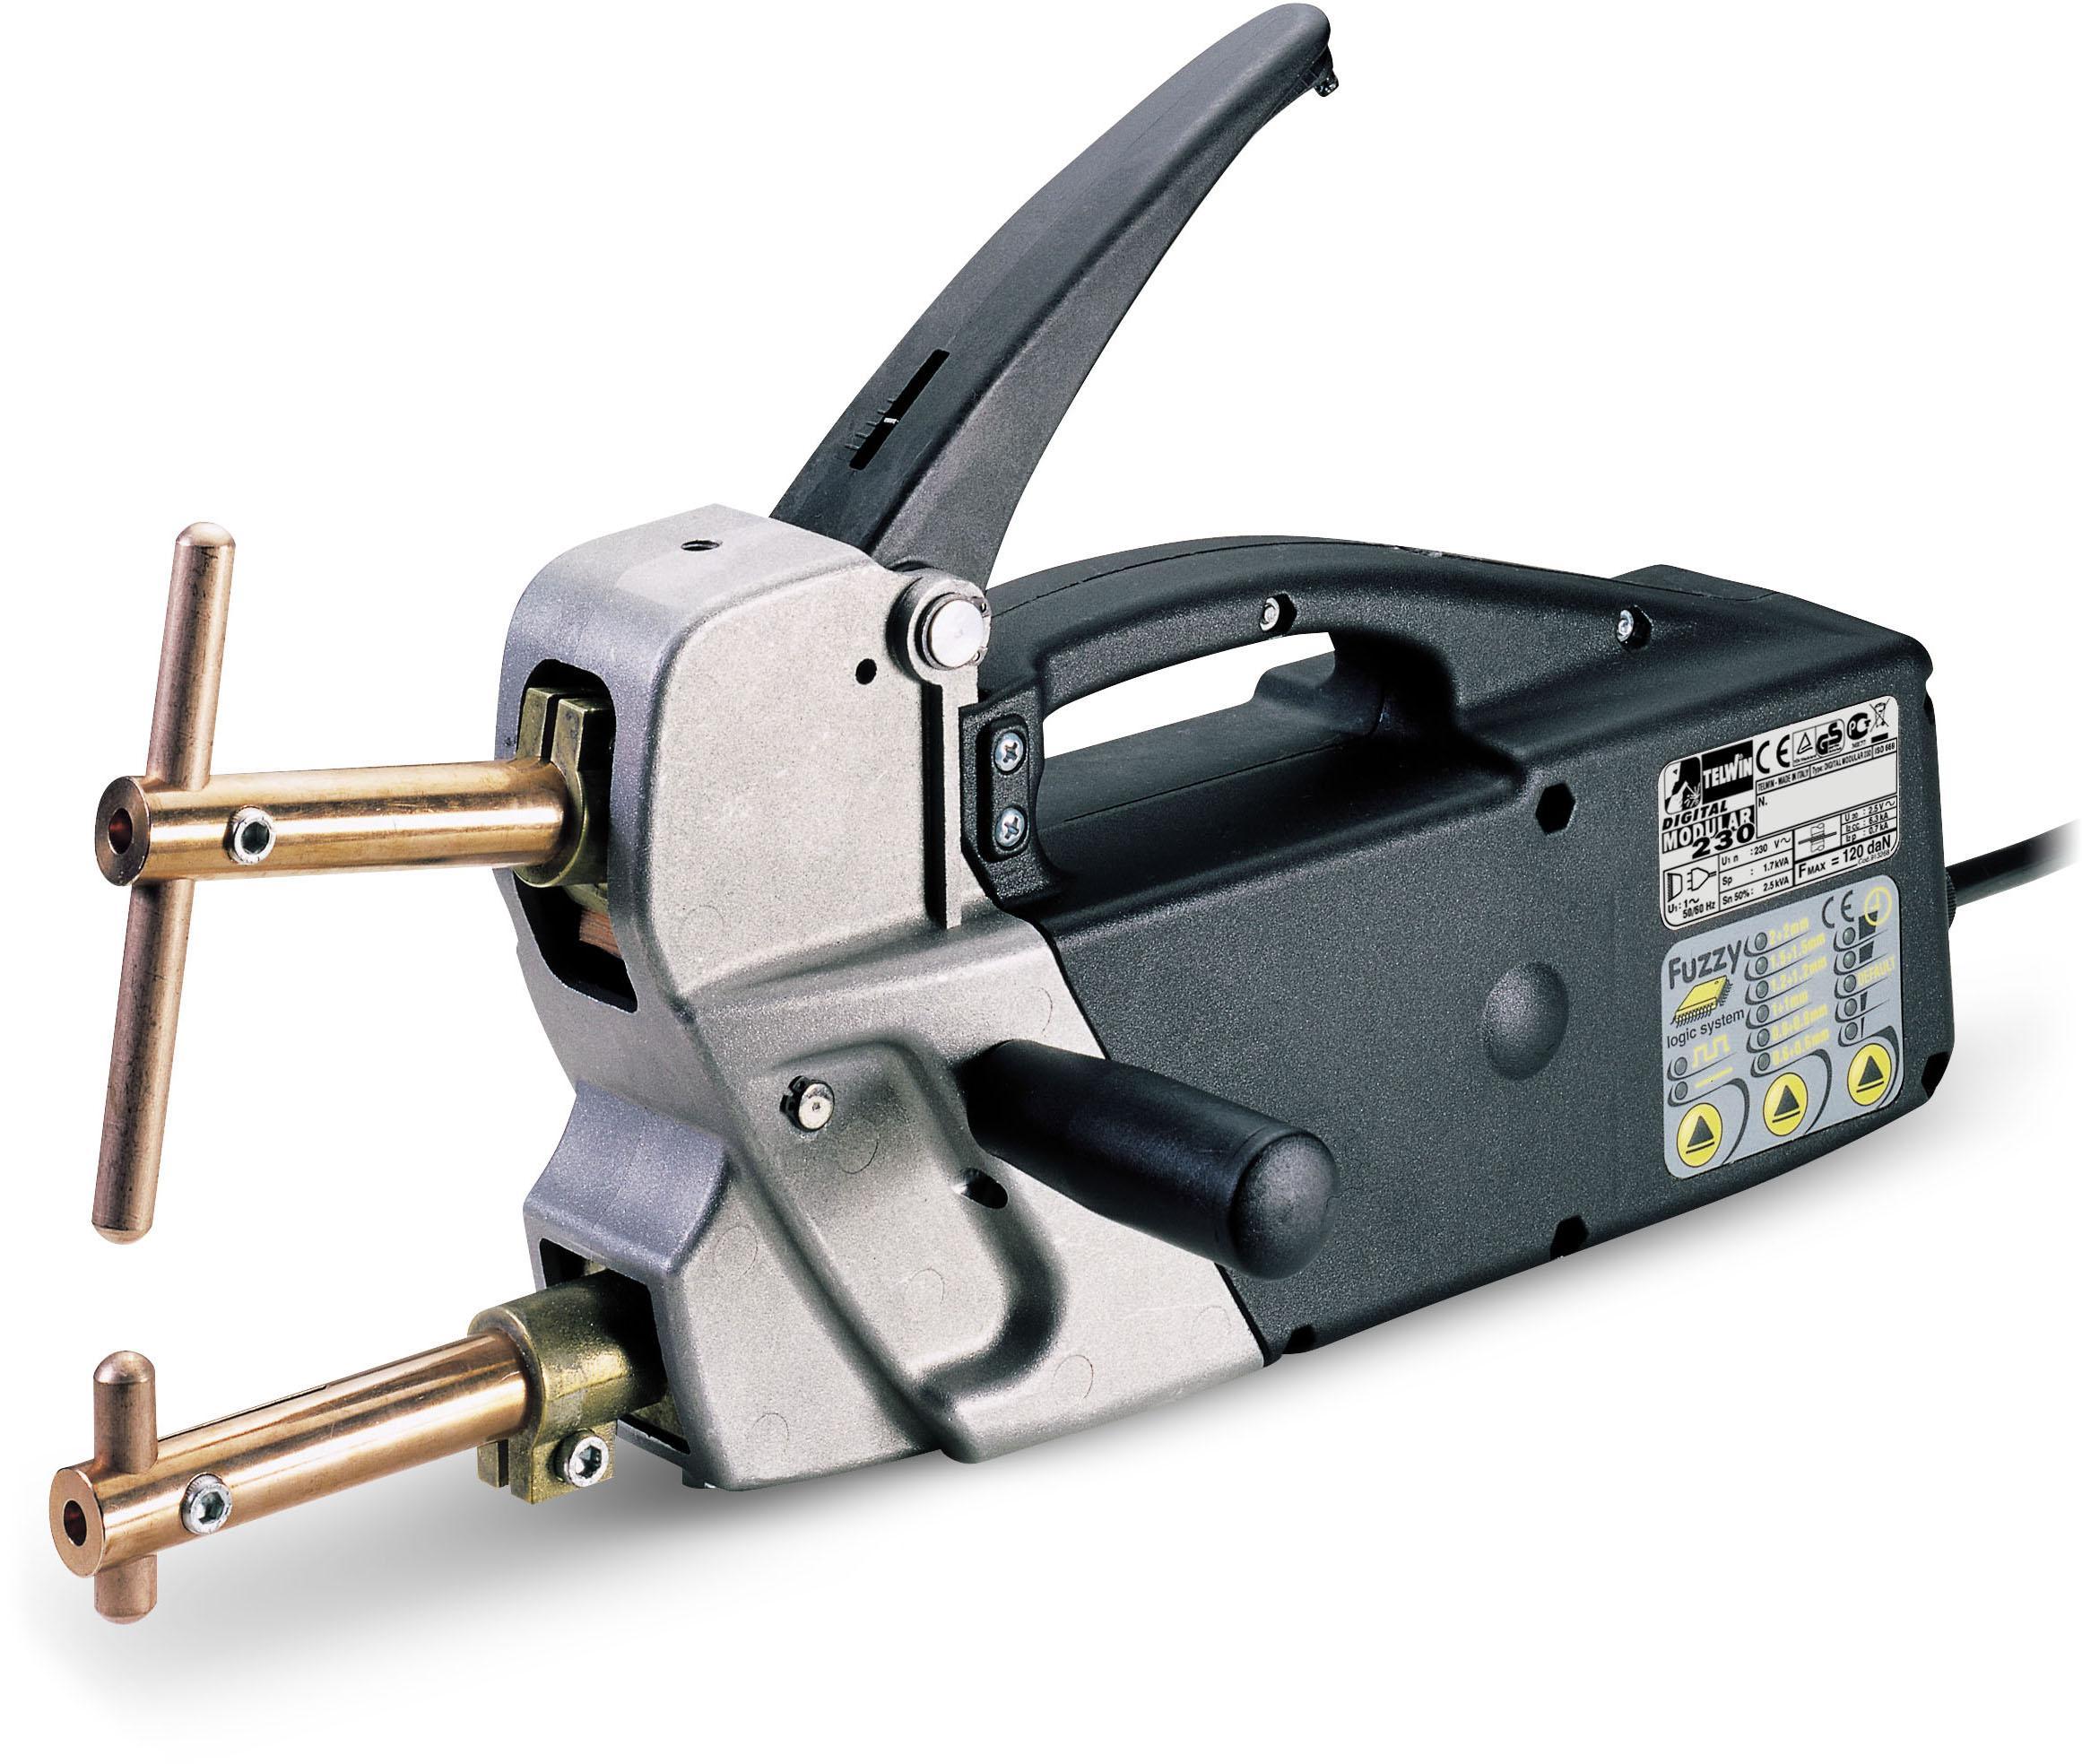 цена на Сварочный аппарат Telwin Digital modular 230